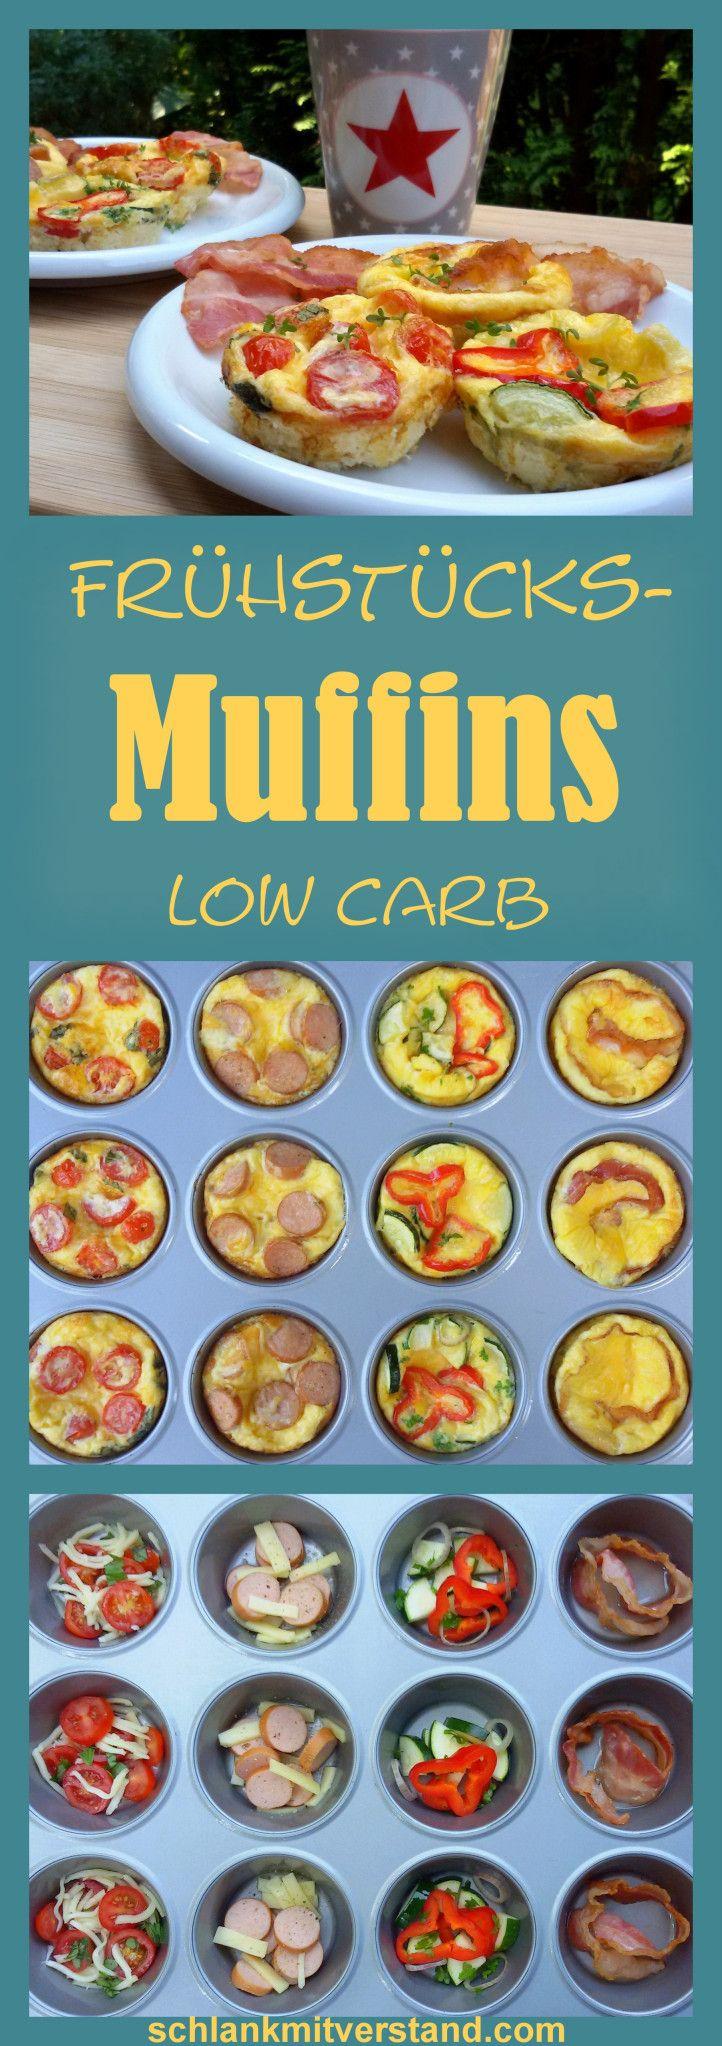 Frühstücks-Muffins mit Ei low carb #frühstückundbrunch